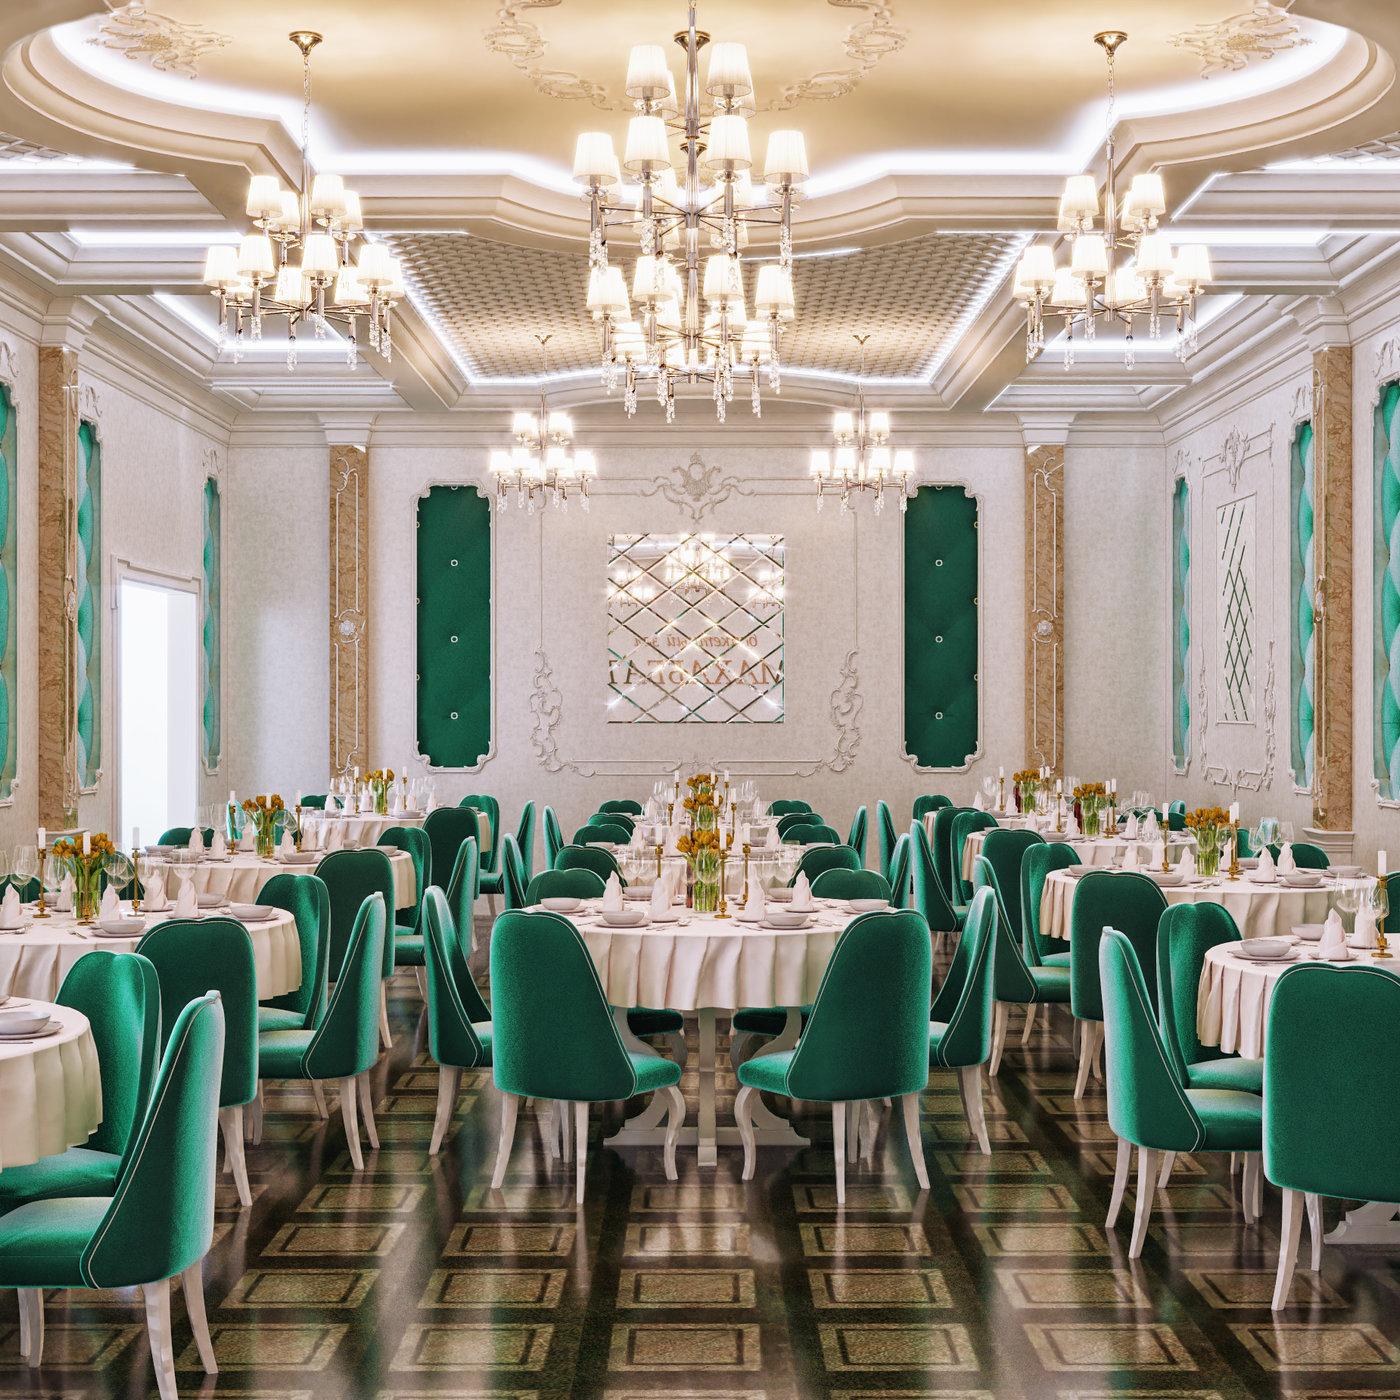 Luxury restaurant in Astana